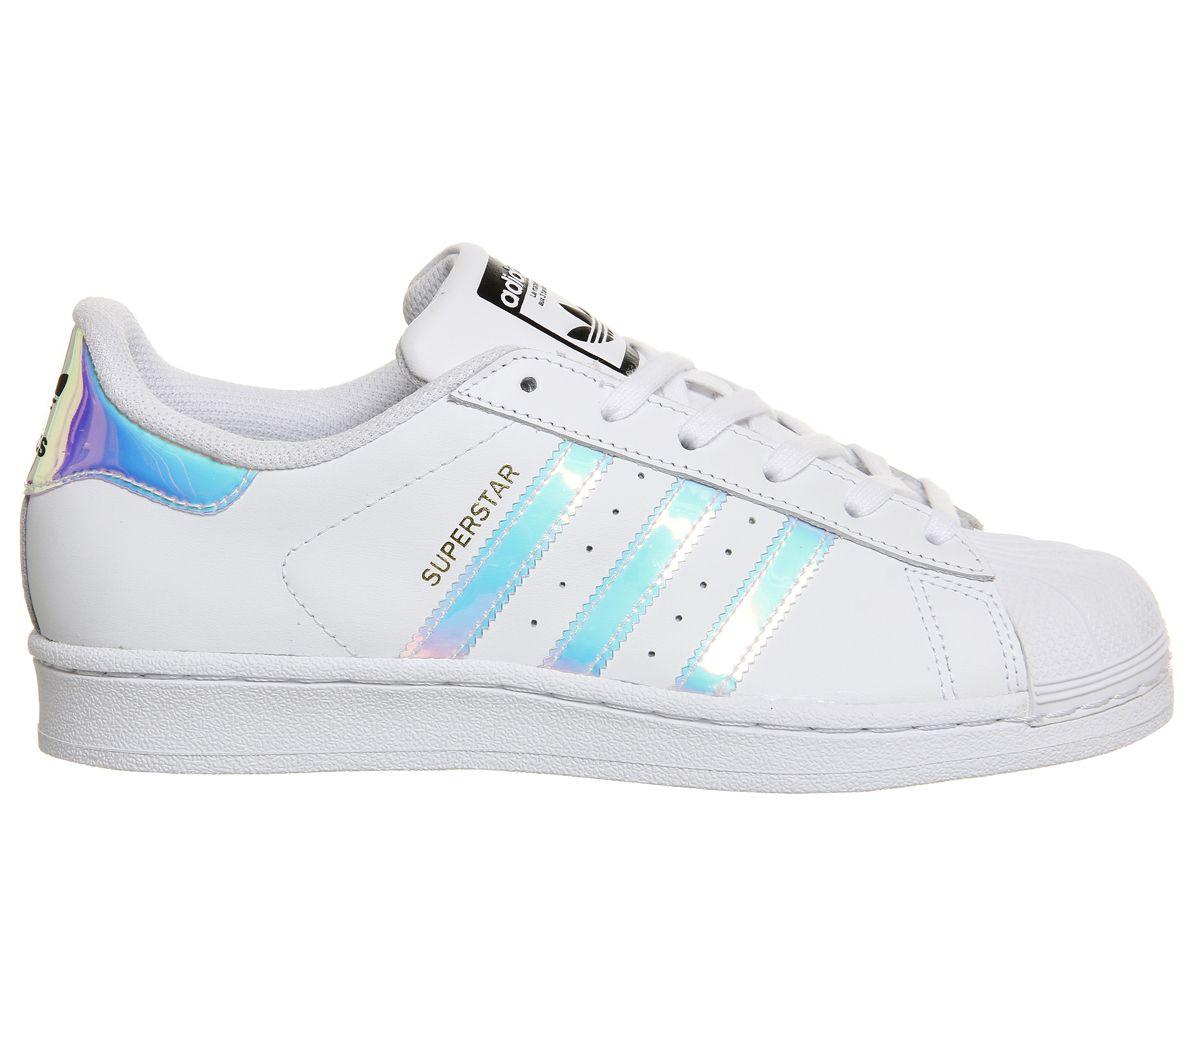 c687149625ec Adidas Superstar White Metallic Silver White - Hers trainers